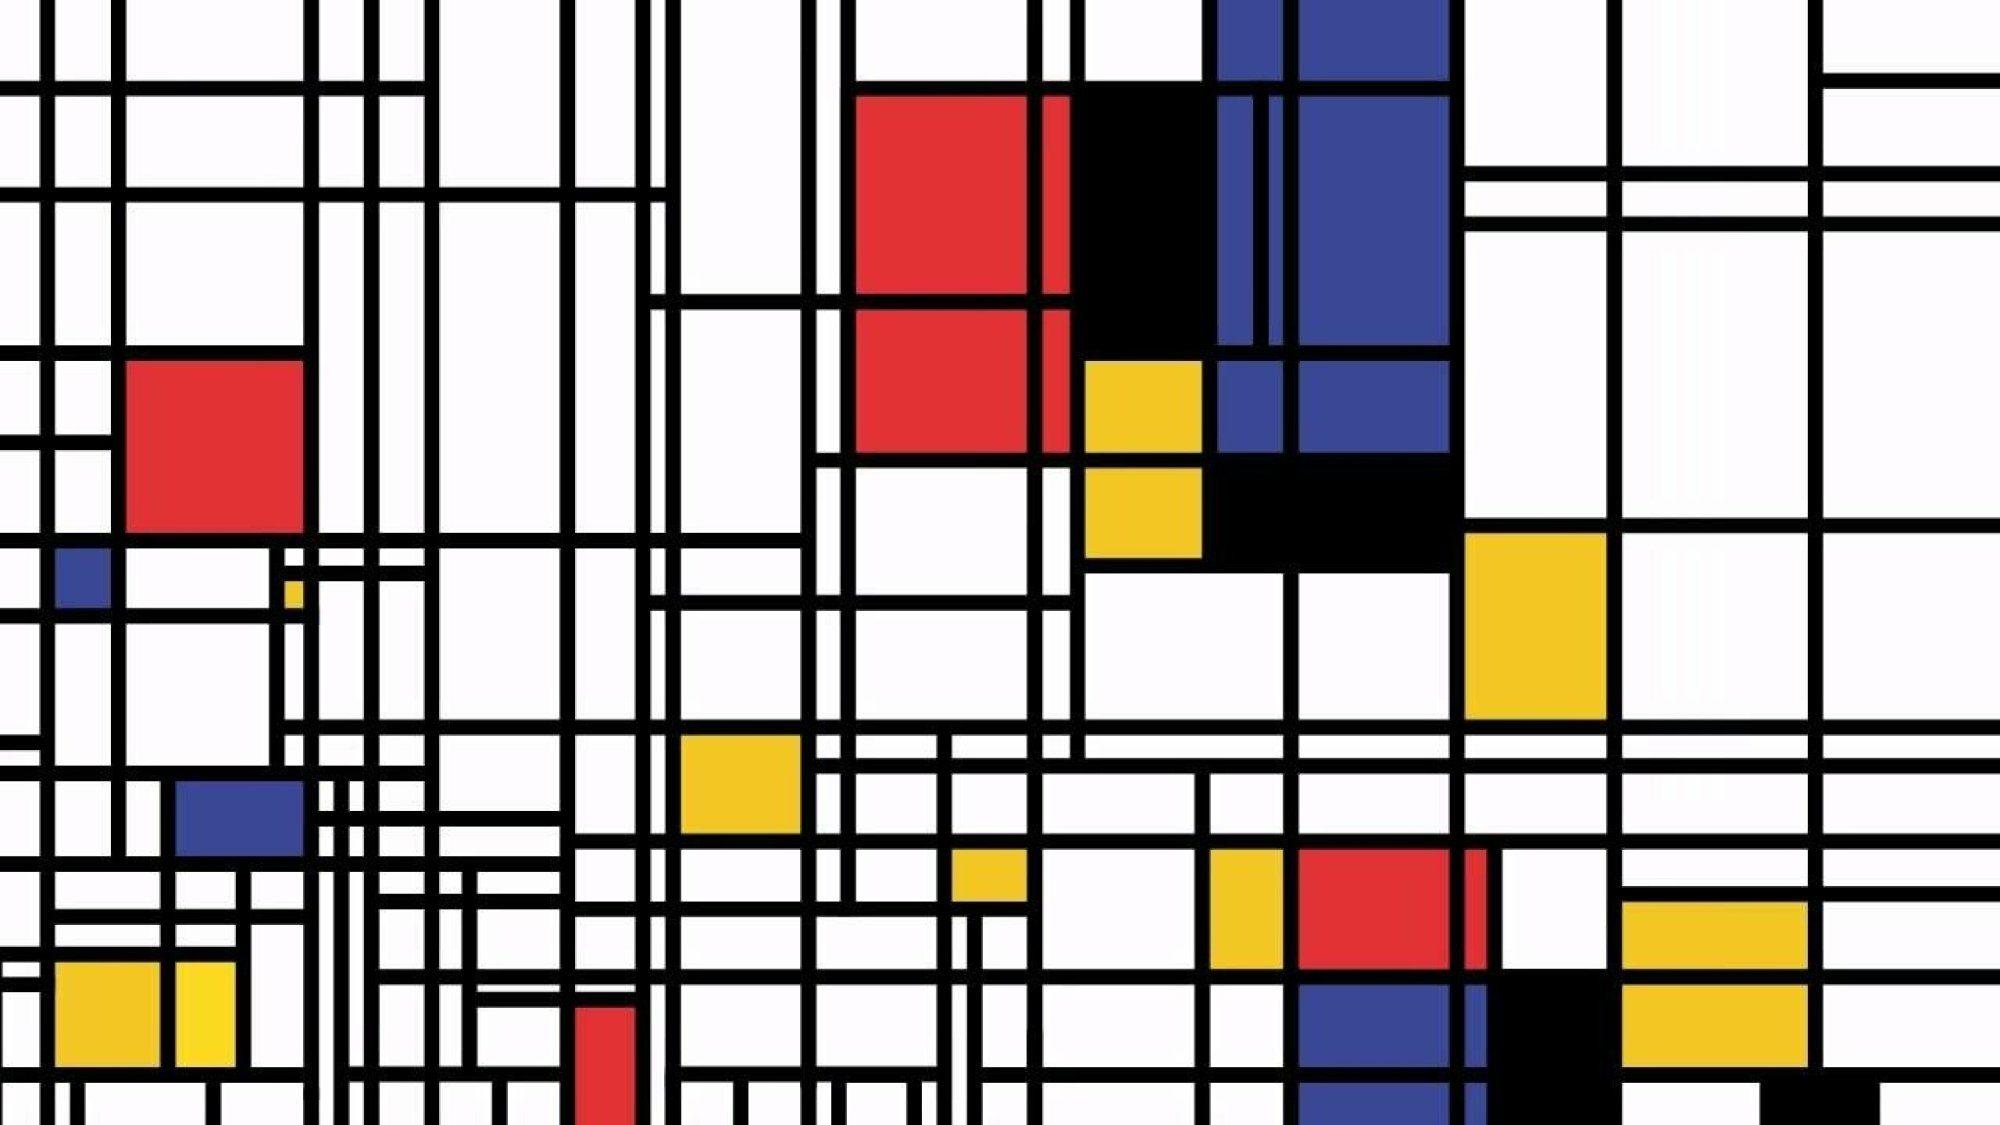 minimalizm-v-interere-foto_12-3738837